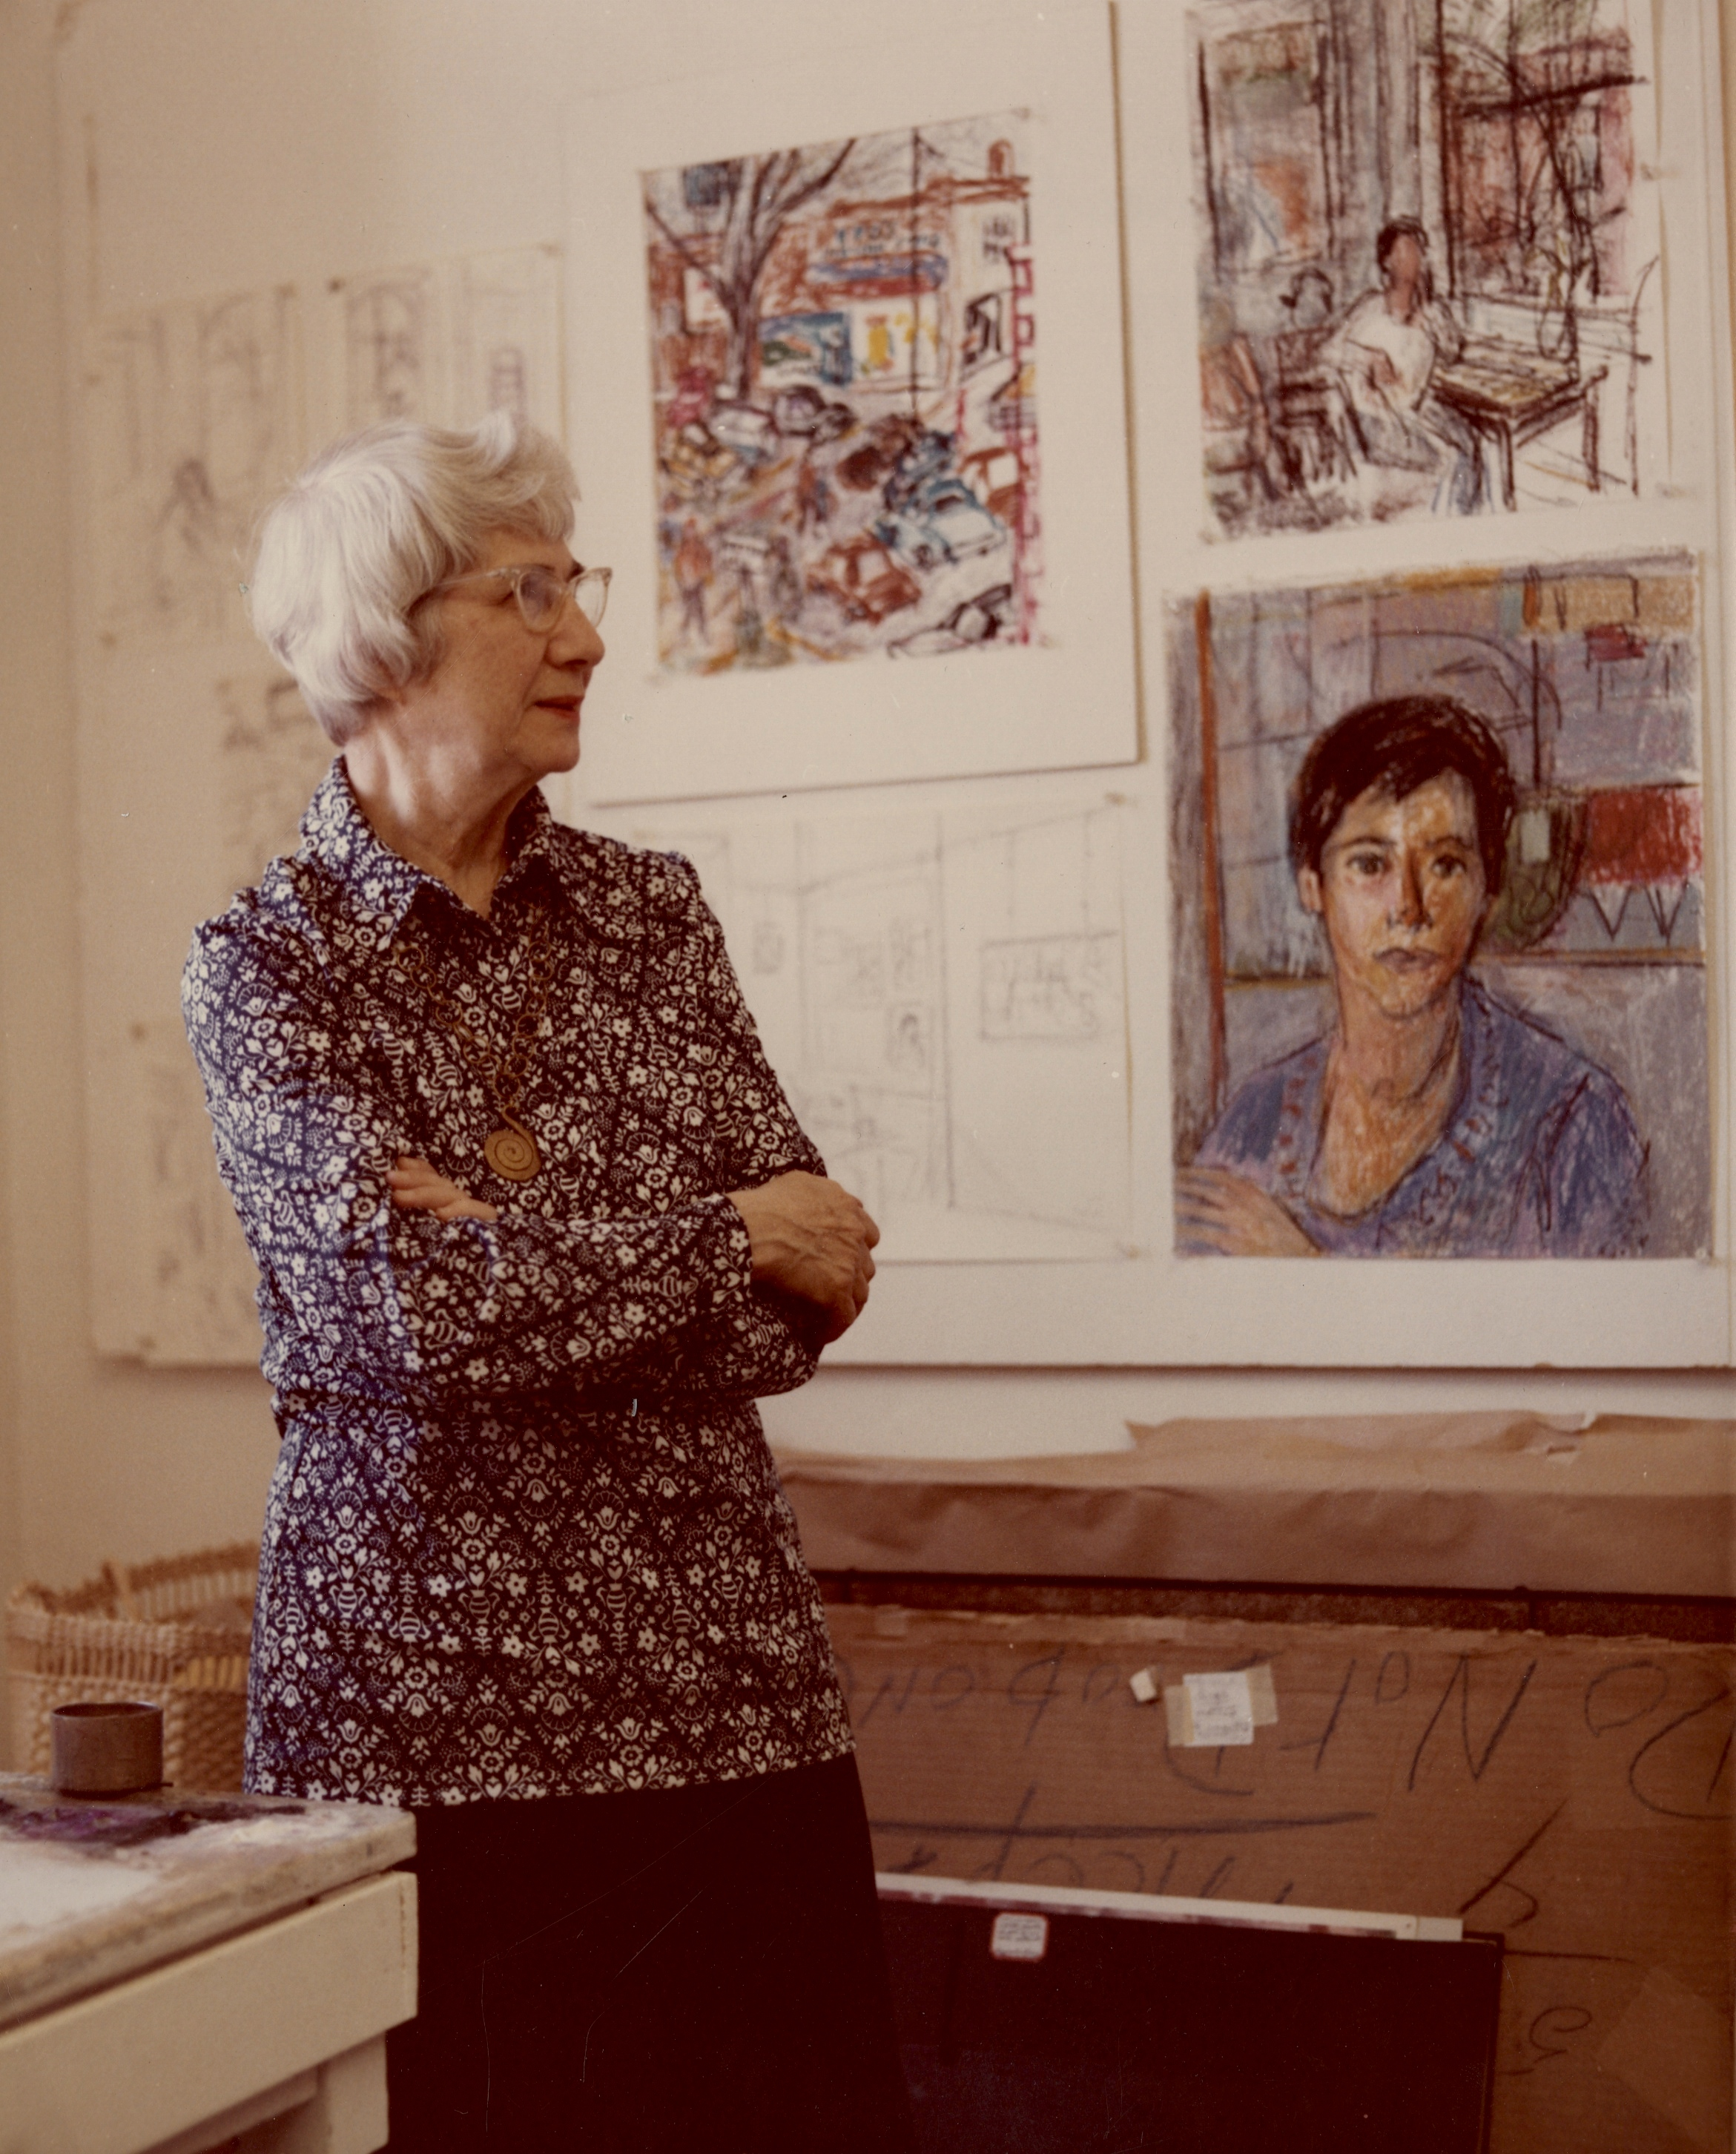 T Pollak and her art work_1975.jpg